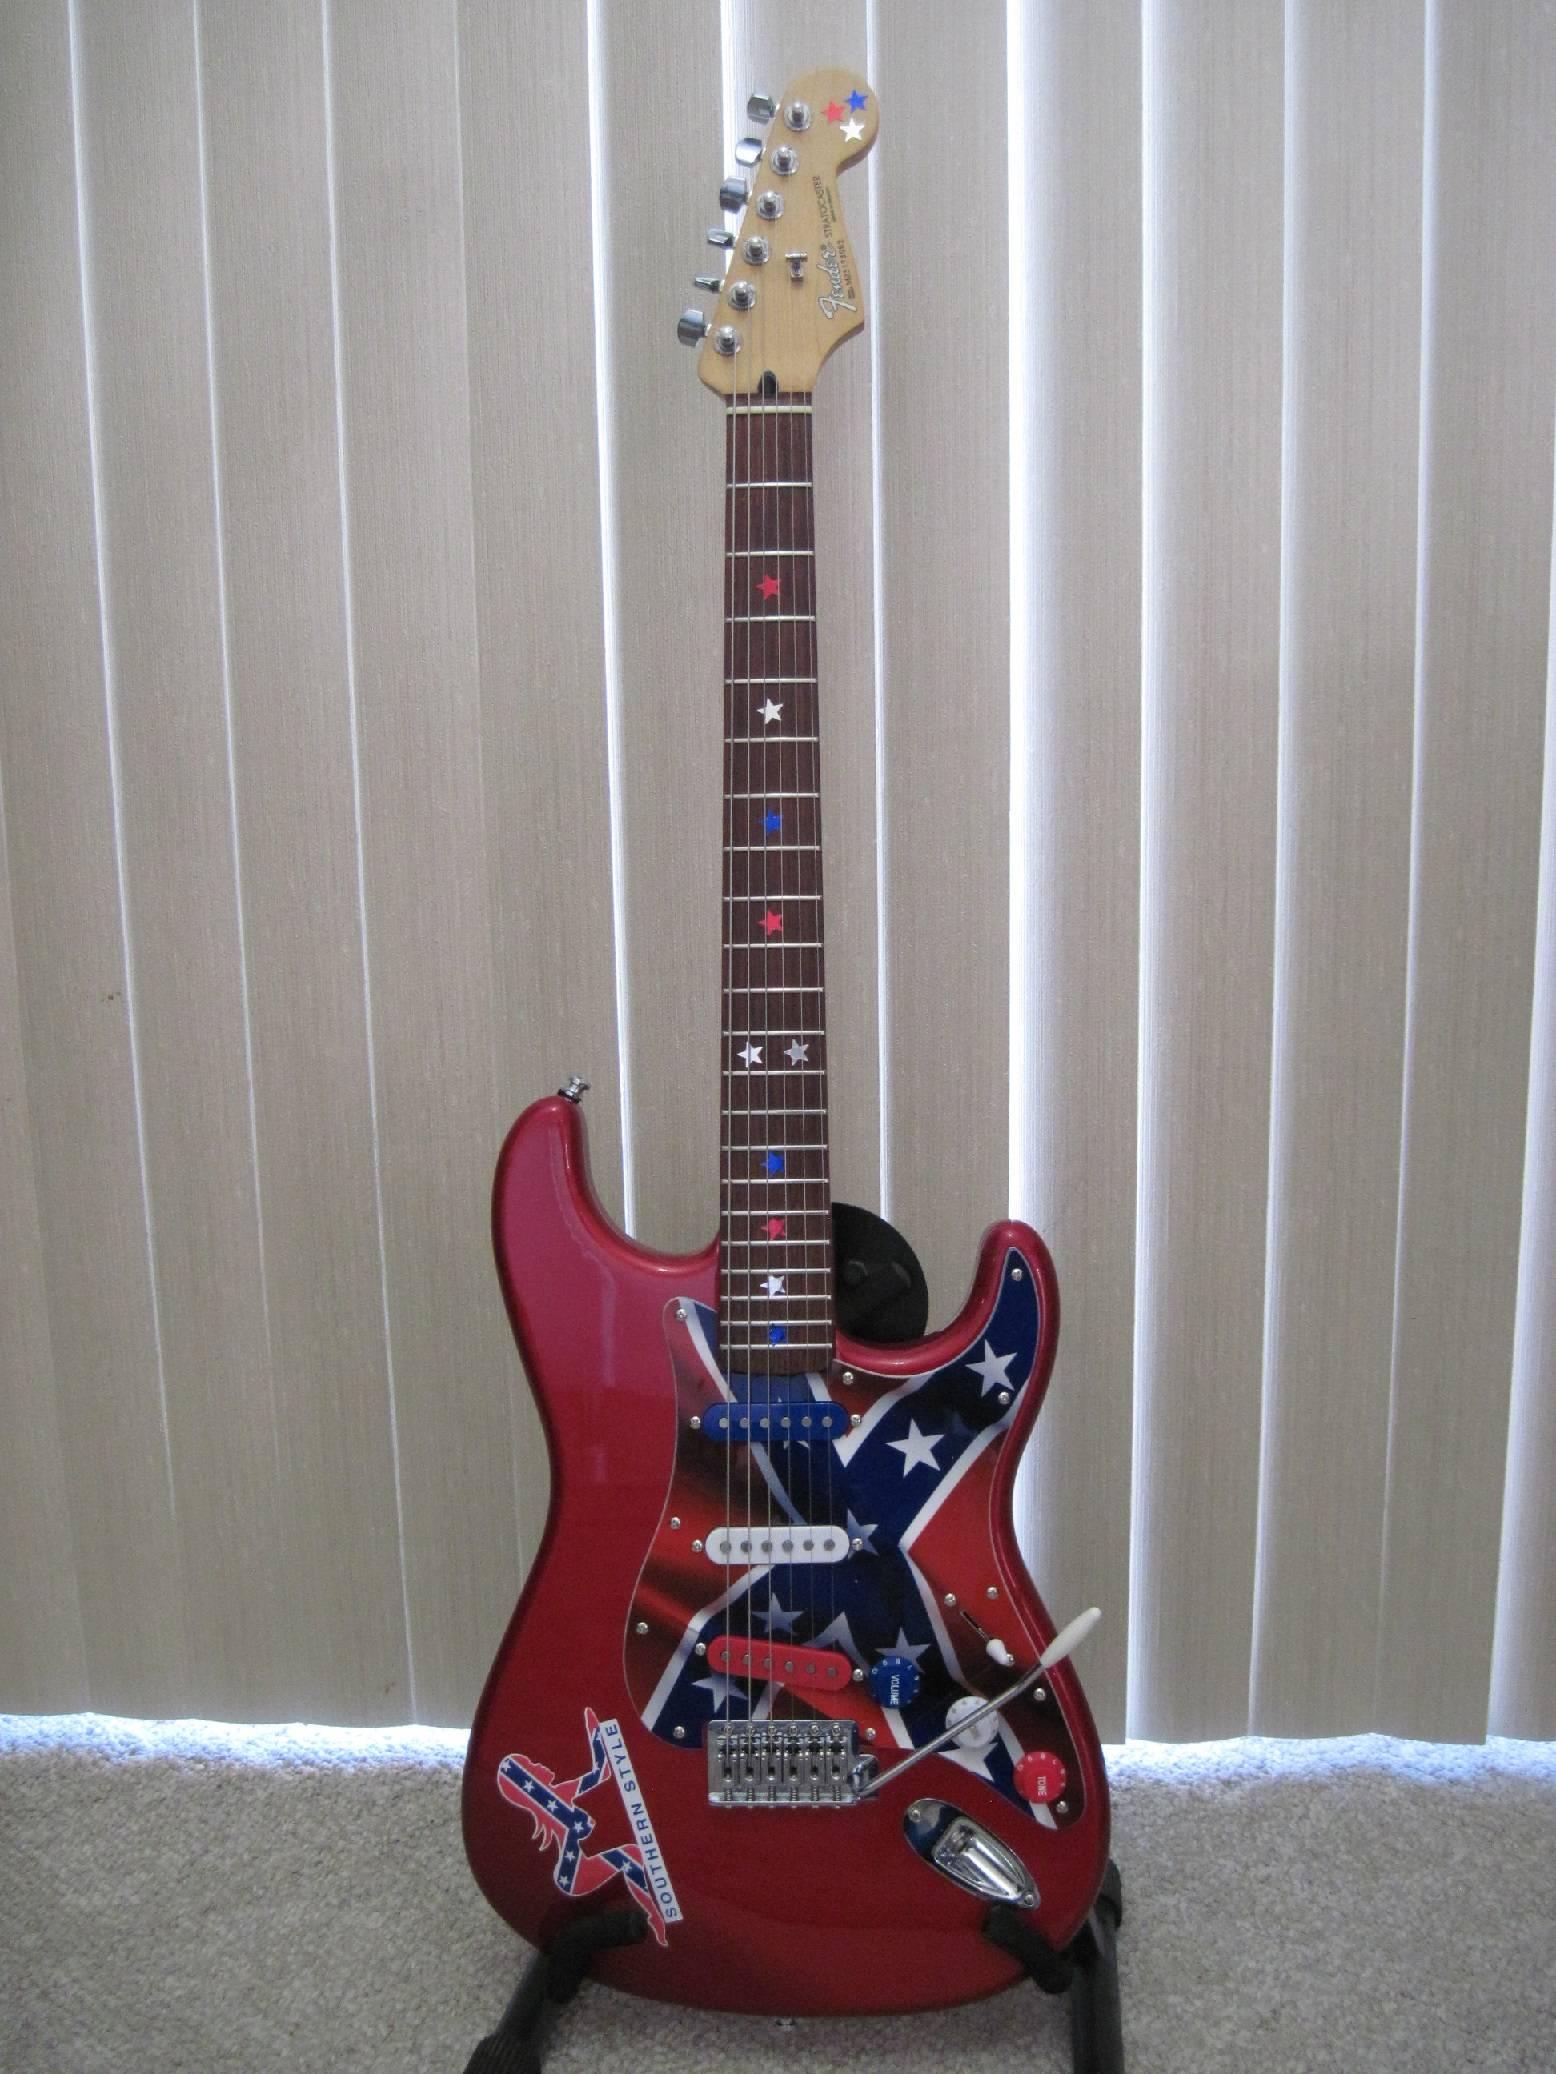 2005 Fender Stratocaster MIM Customized